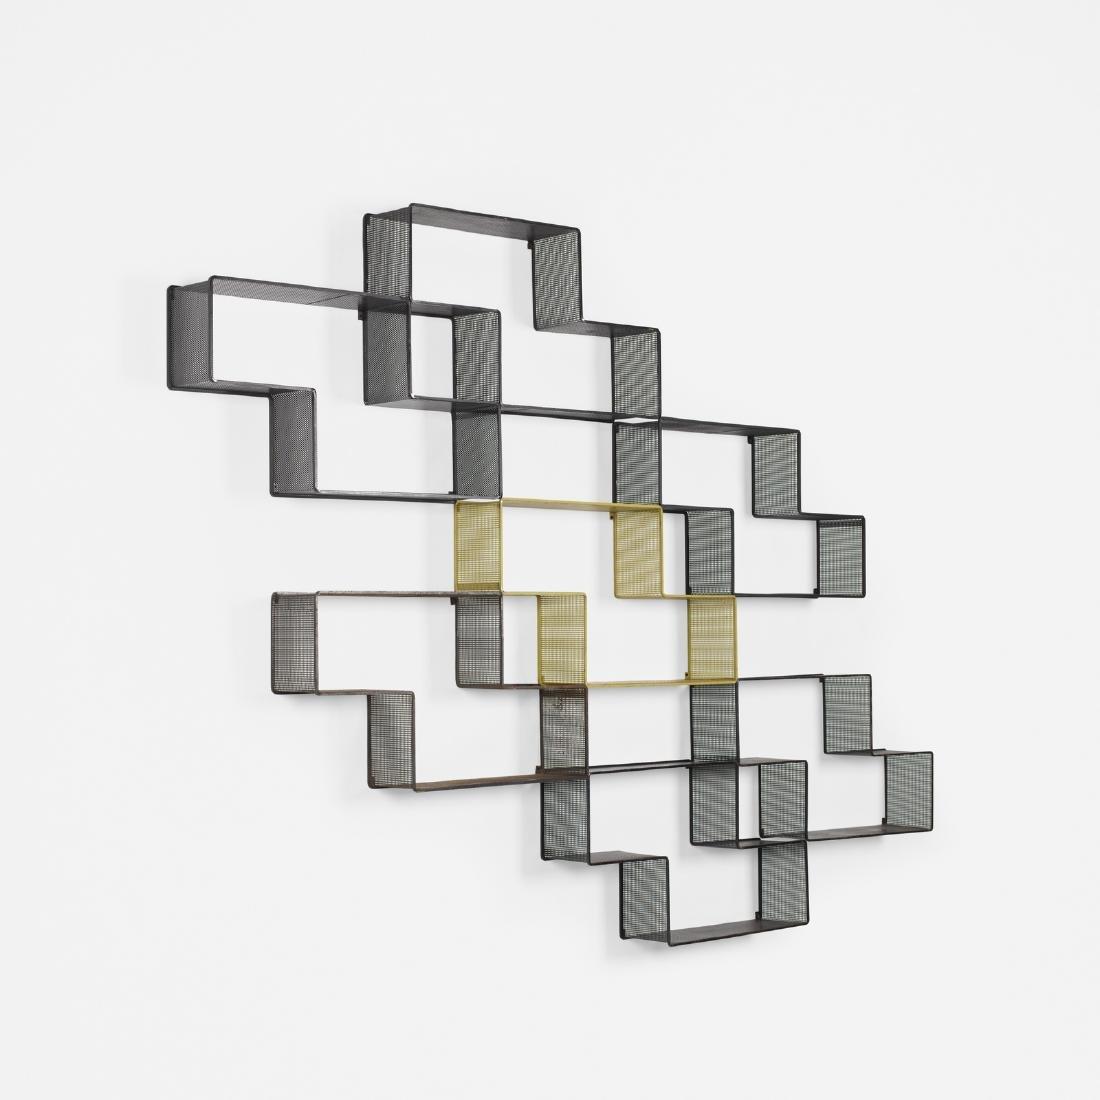 Mathieu Mategot, Dedal shelves, set of seven